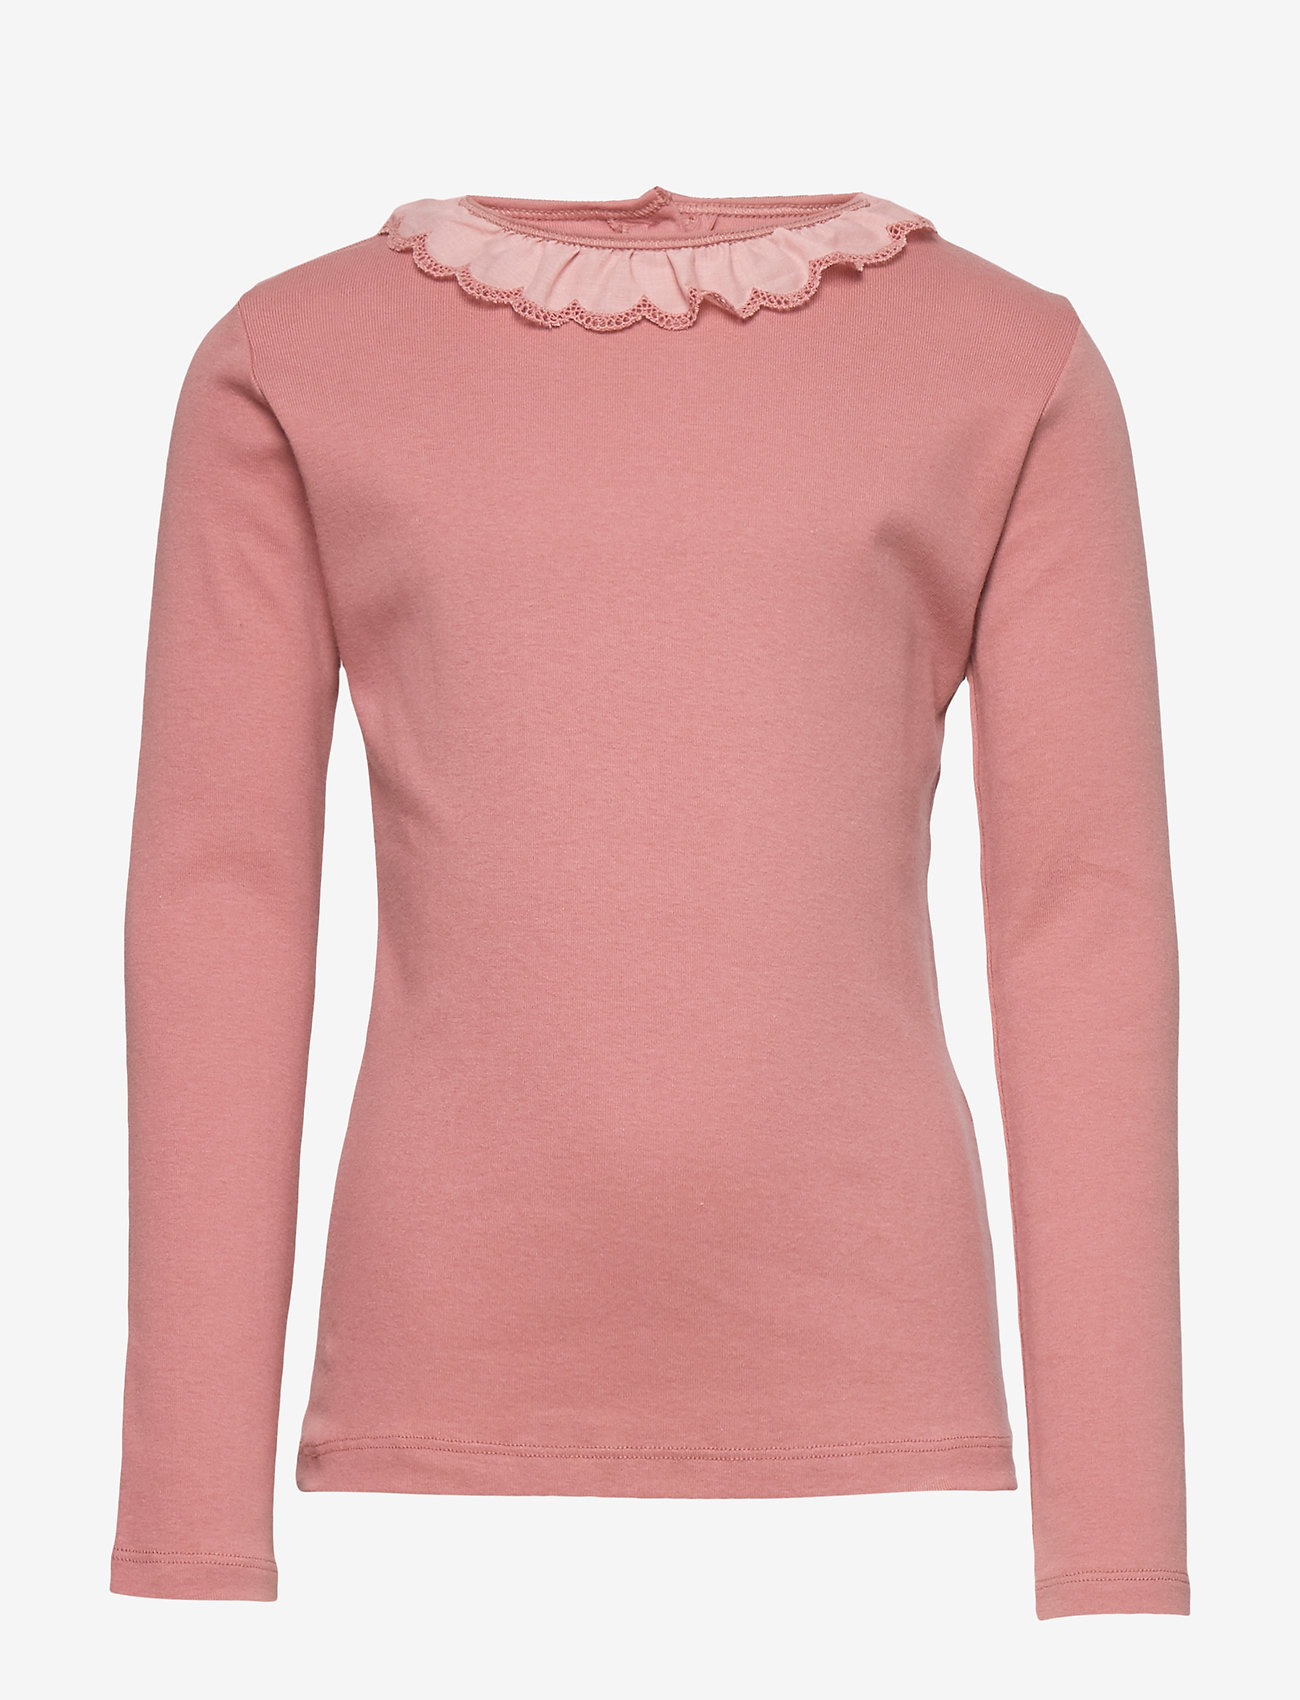 Noa Noa Miniature - T-shirt - long-sleeved t-shirts - dusty rose - 0